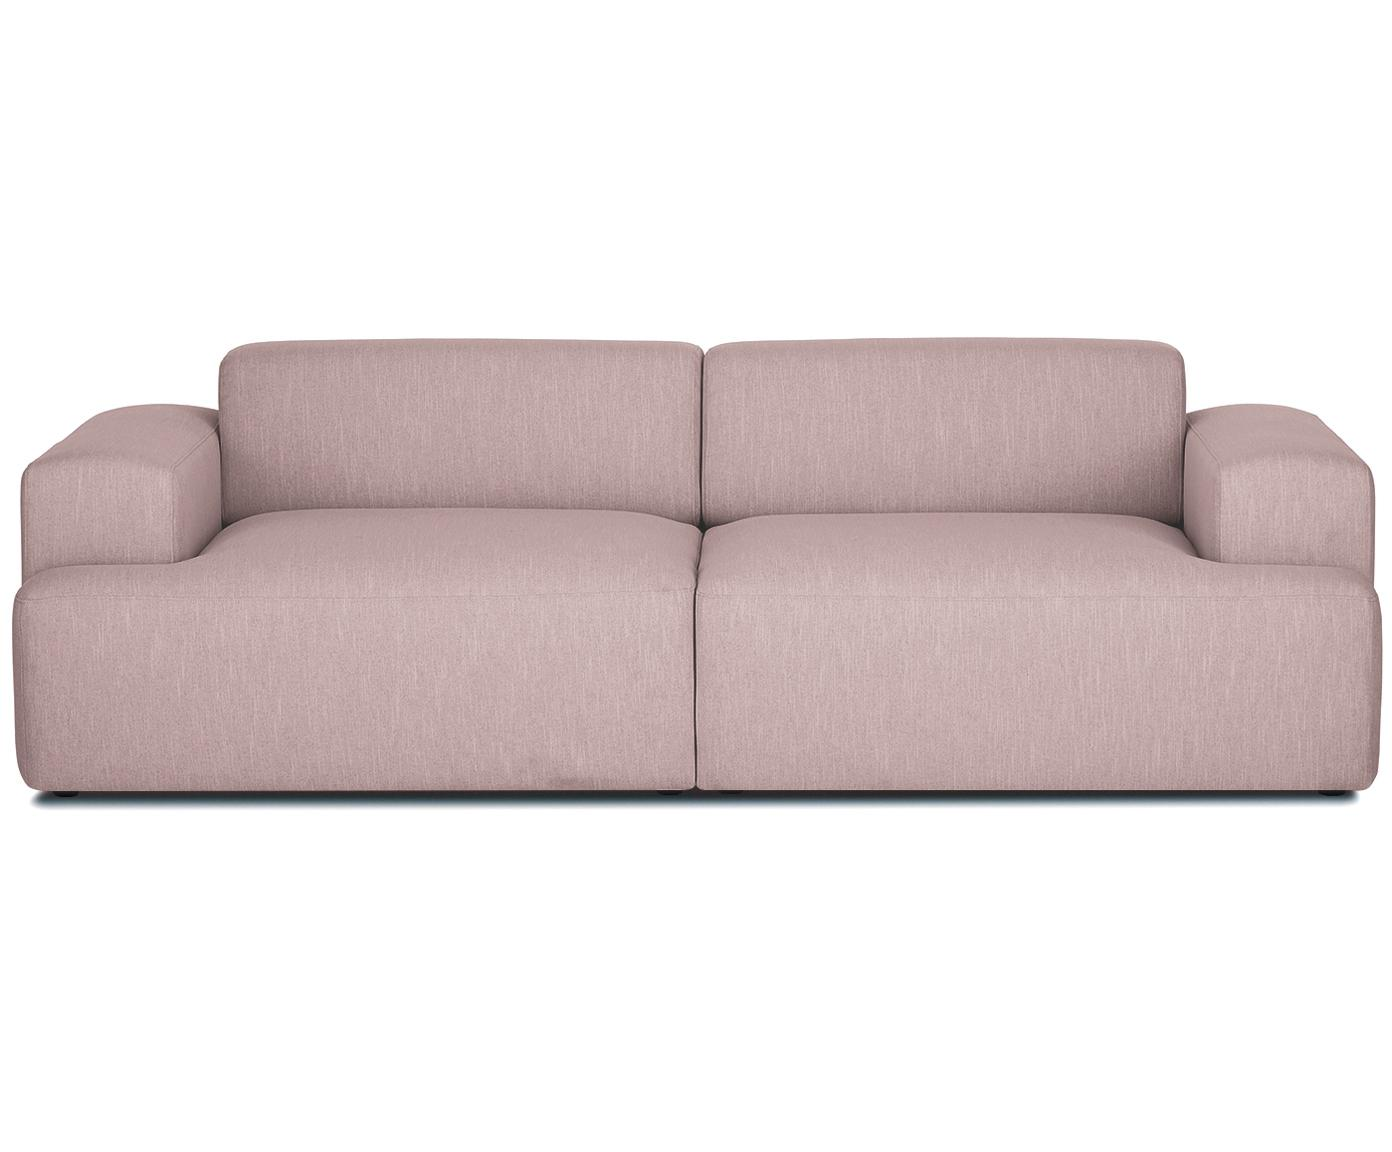 Sofa Melva (3-Sitzer), Bezug: Polyester 35.000 Scheuert, Gestell: Massives Kiefernholz, Spa, Füße: Kiefernholz, Webstoff Rosa, B 240 x T 101 cm